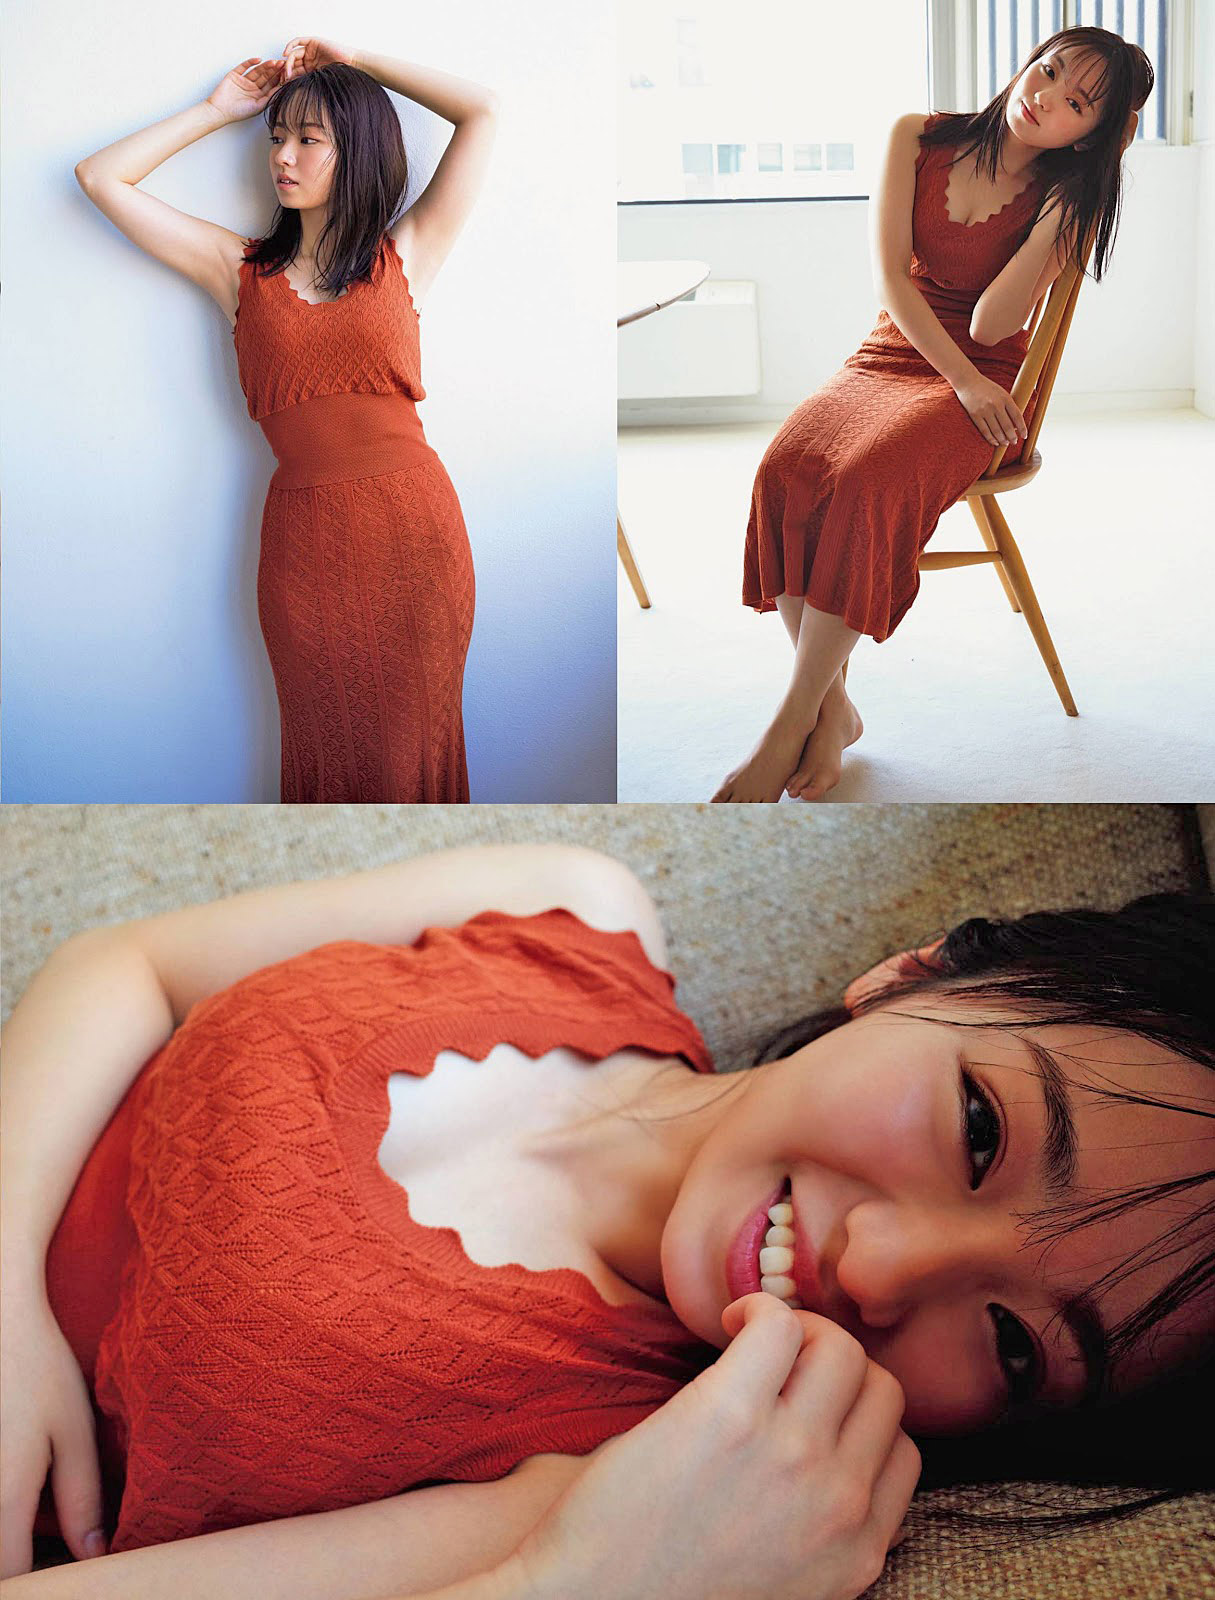 Yui Imaizumi Flash 191105 03.jpg